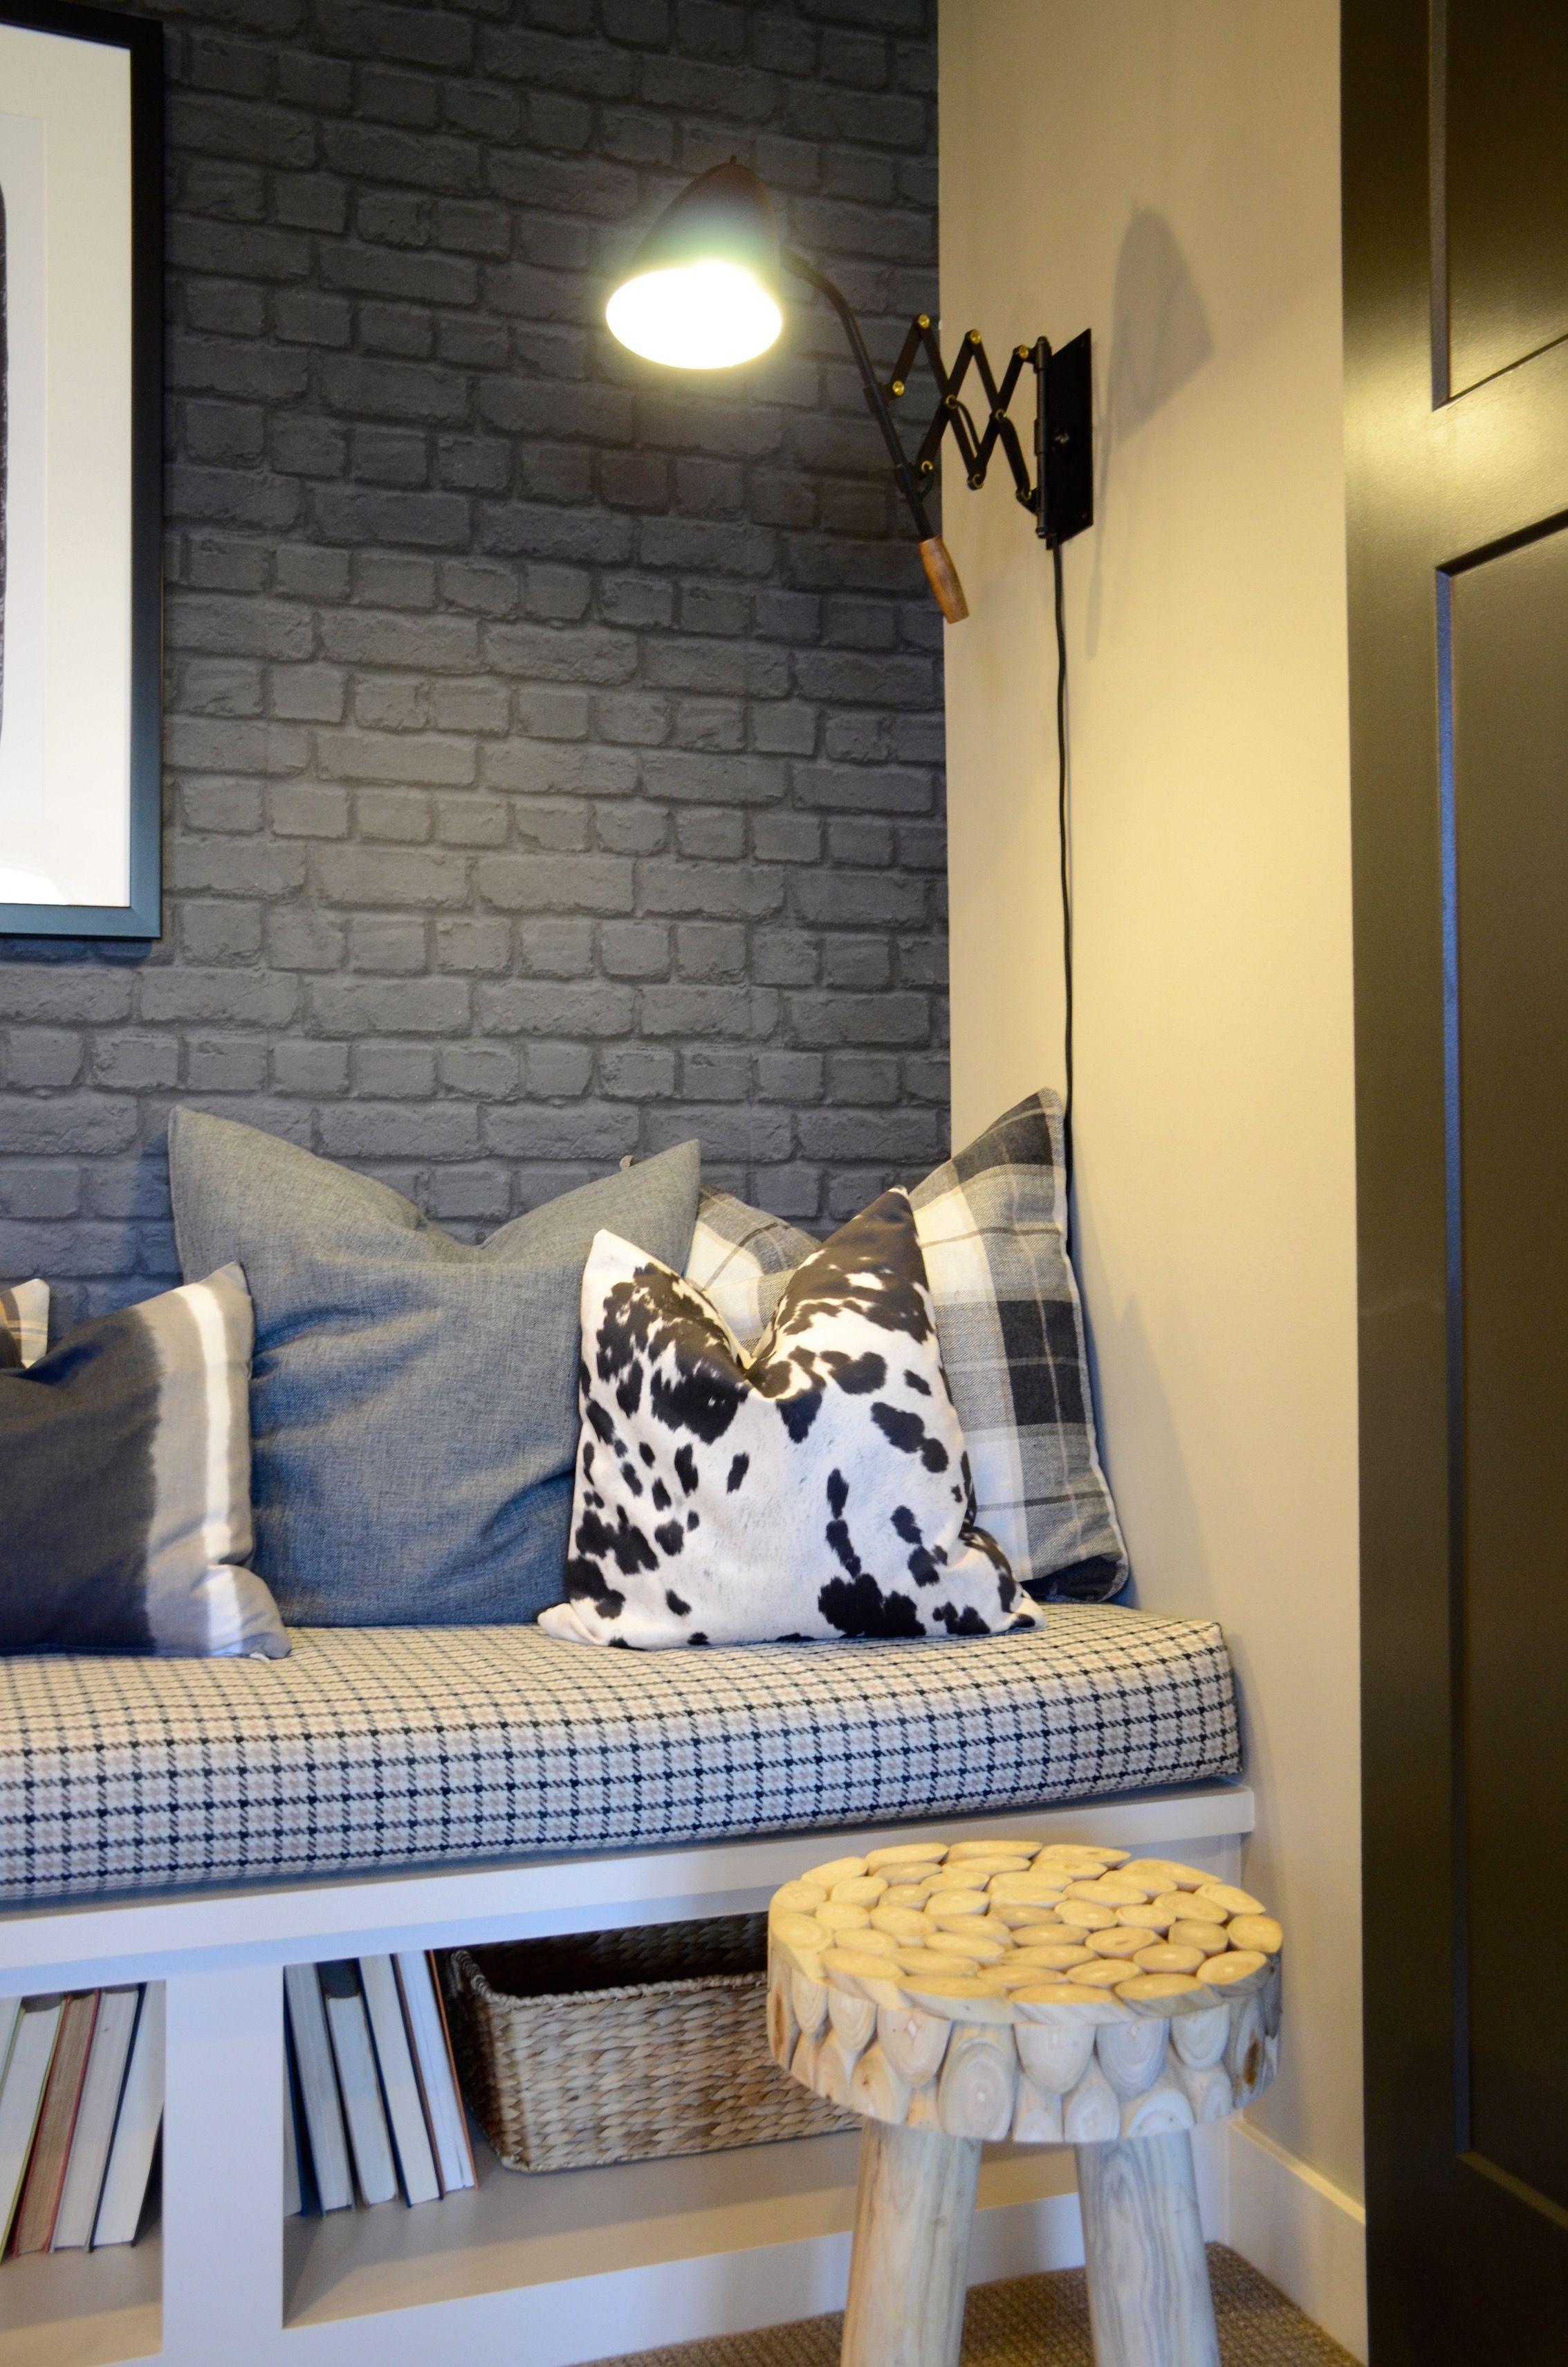 by beautiful island cabinets with kitchen prewar transformation to mcdonald interior portfolios create design interiors custom portfolio build dining lookbook hall how dering paula